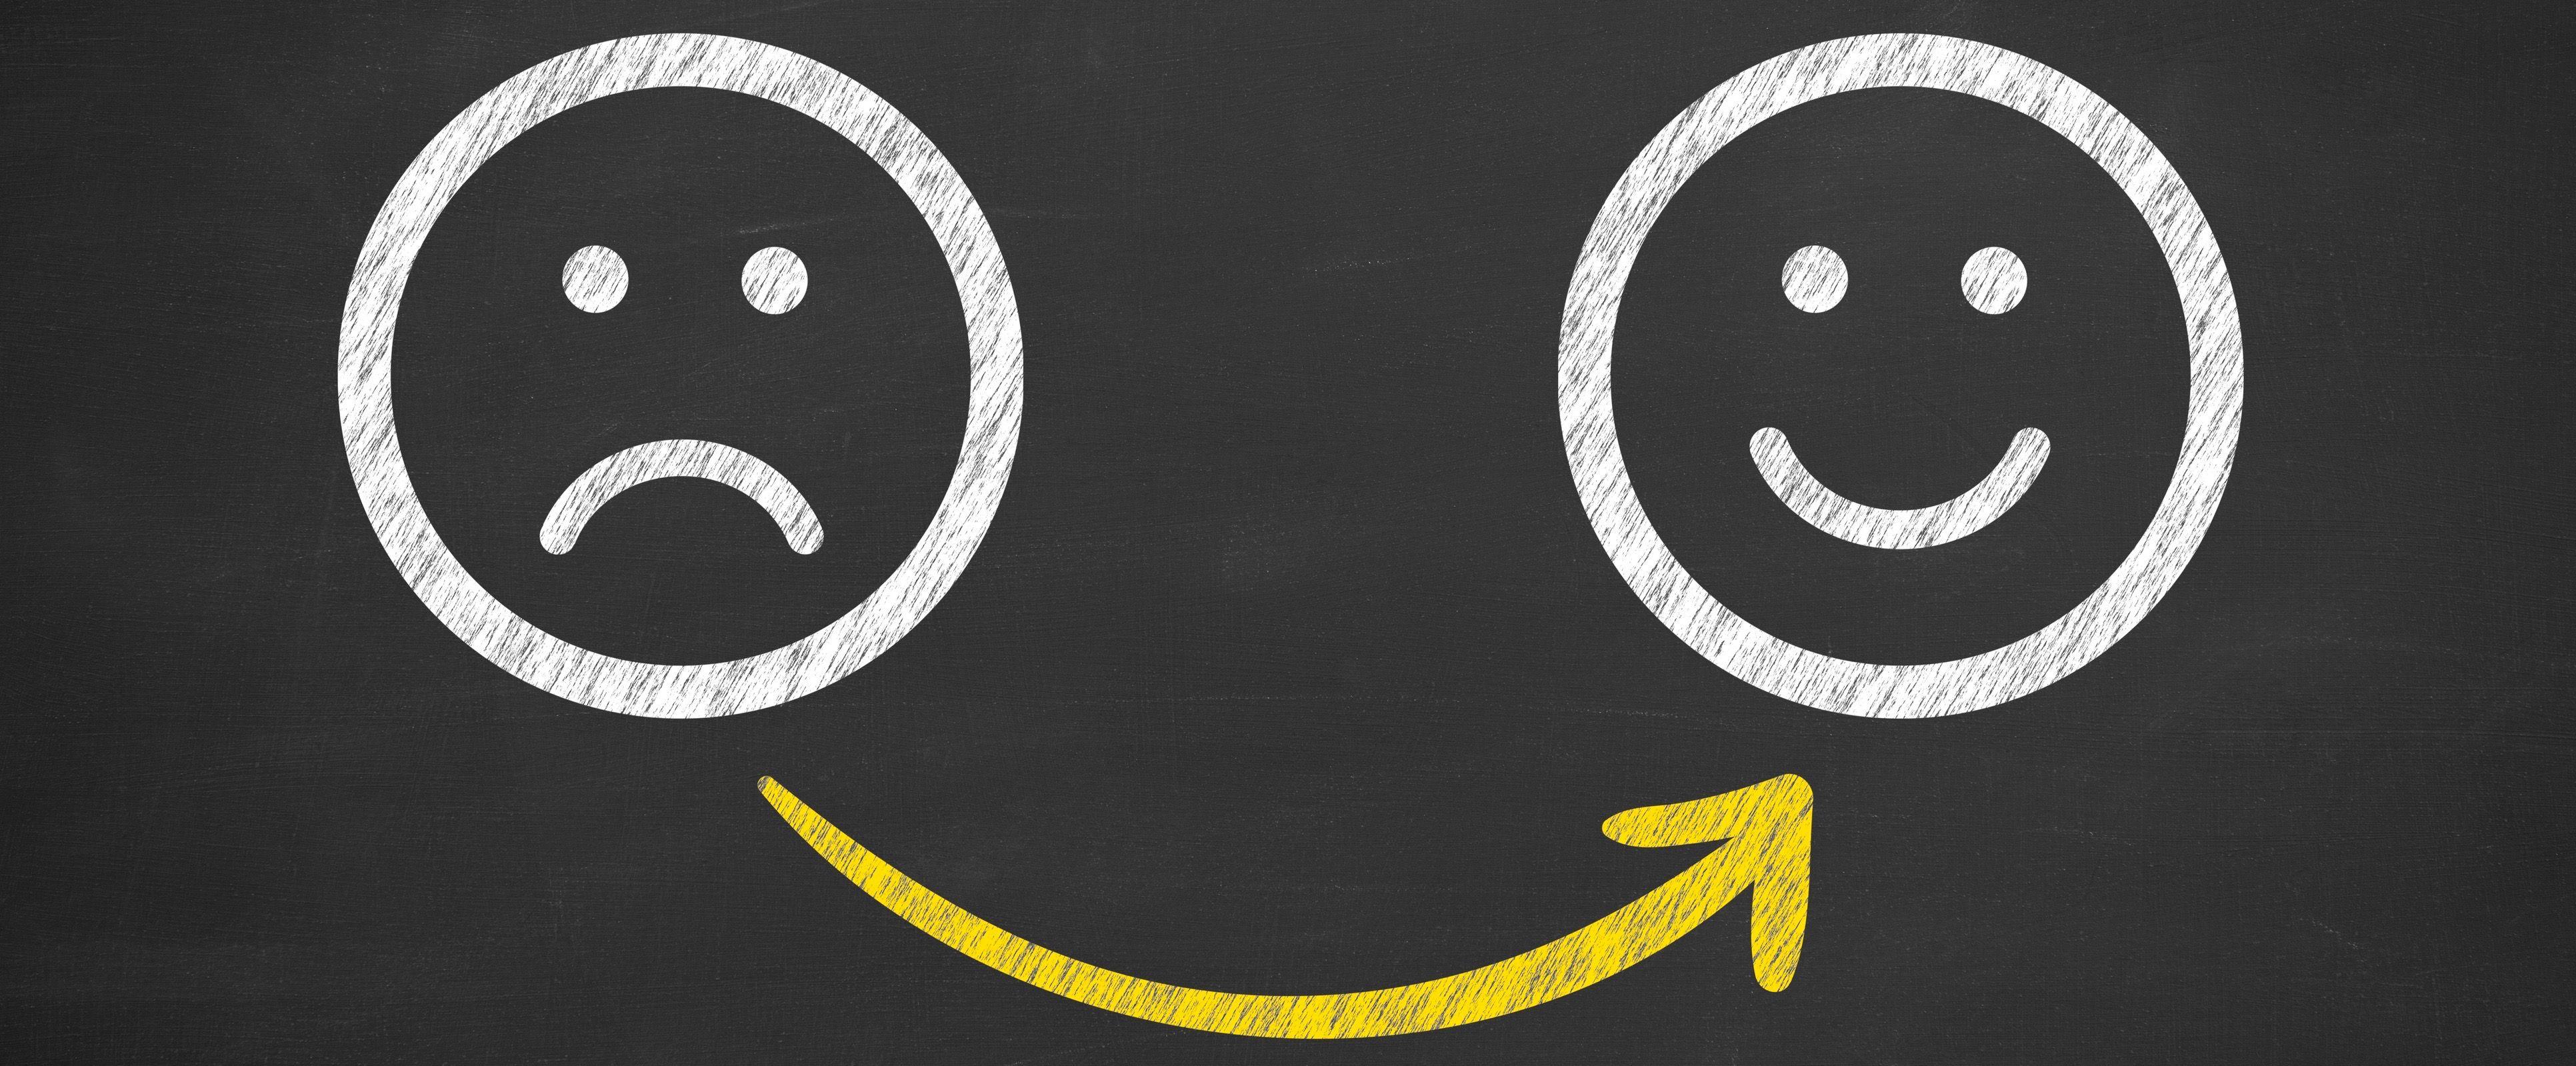 7 of the Best Mood-Boosting Websites We Could Find